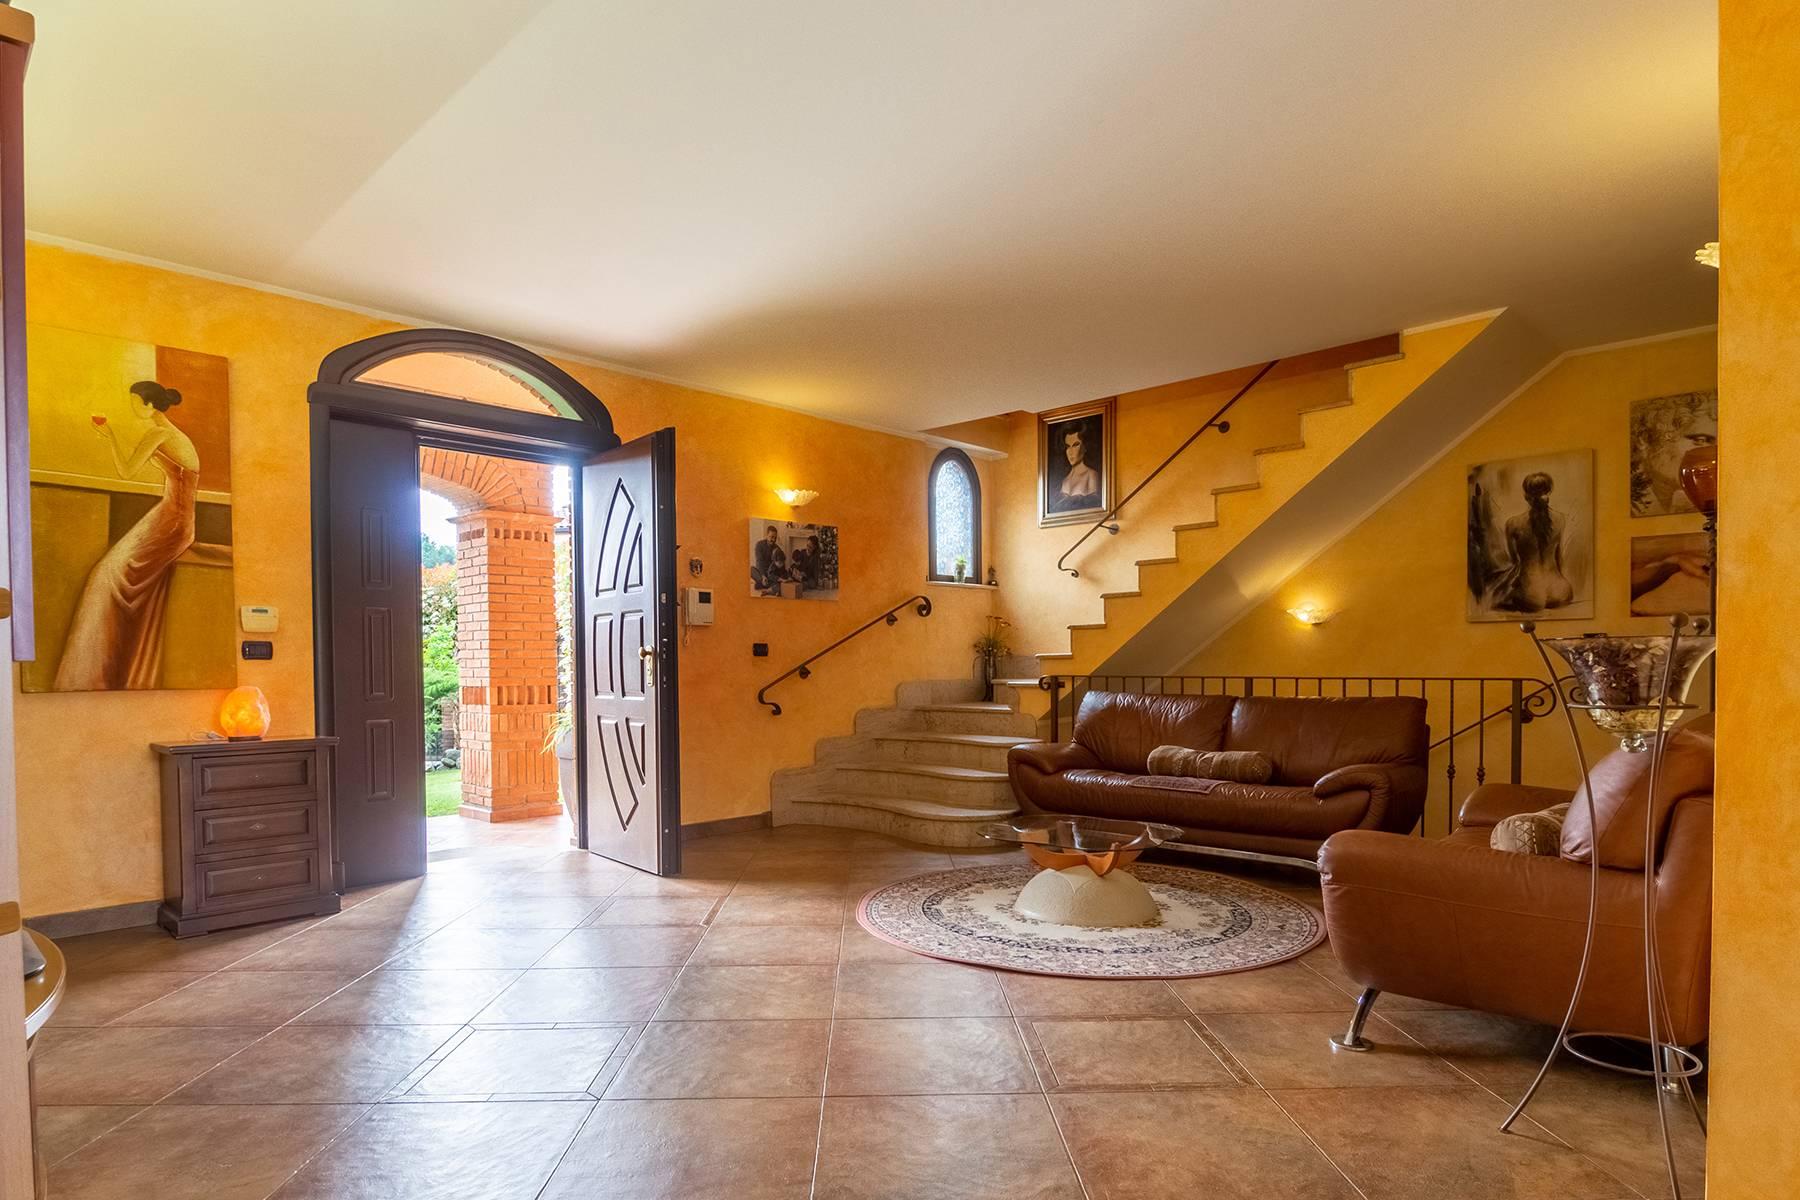 Villa in Vendita a Rosta: 5 locali, 182 mq - Foto 11